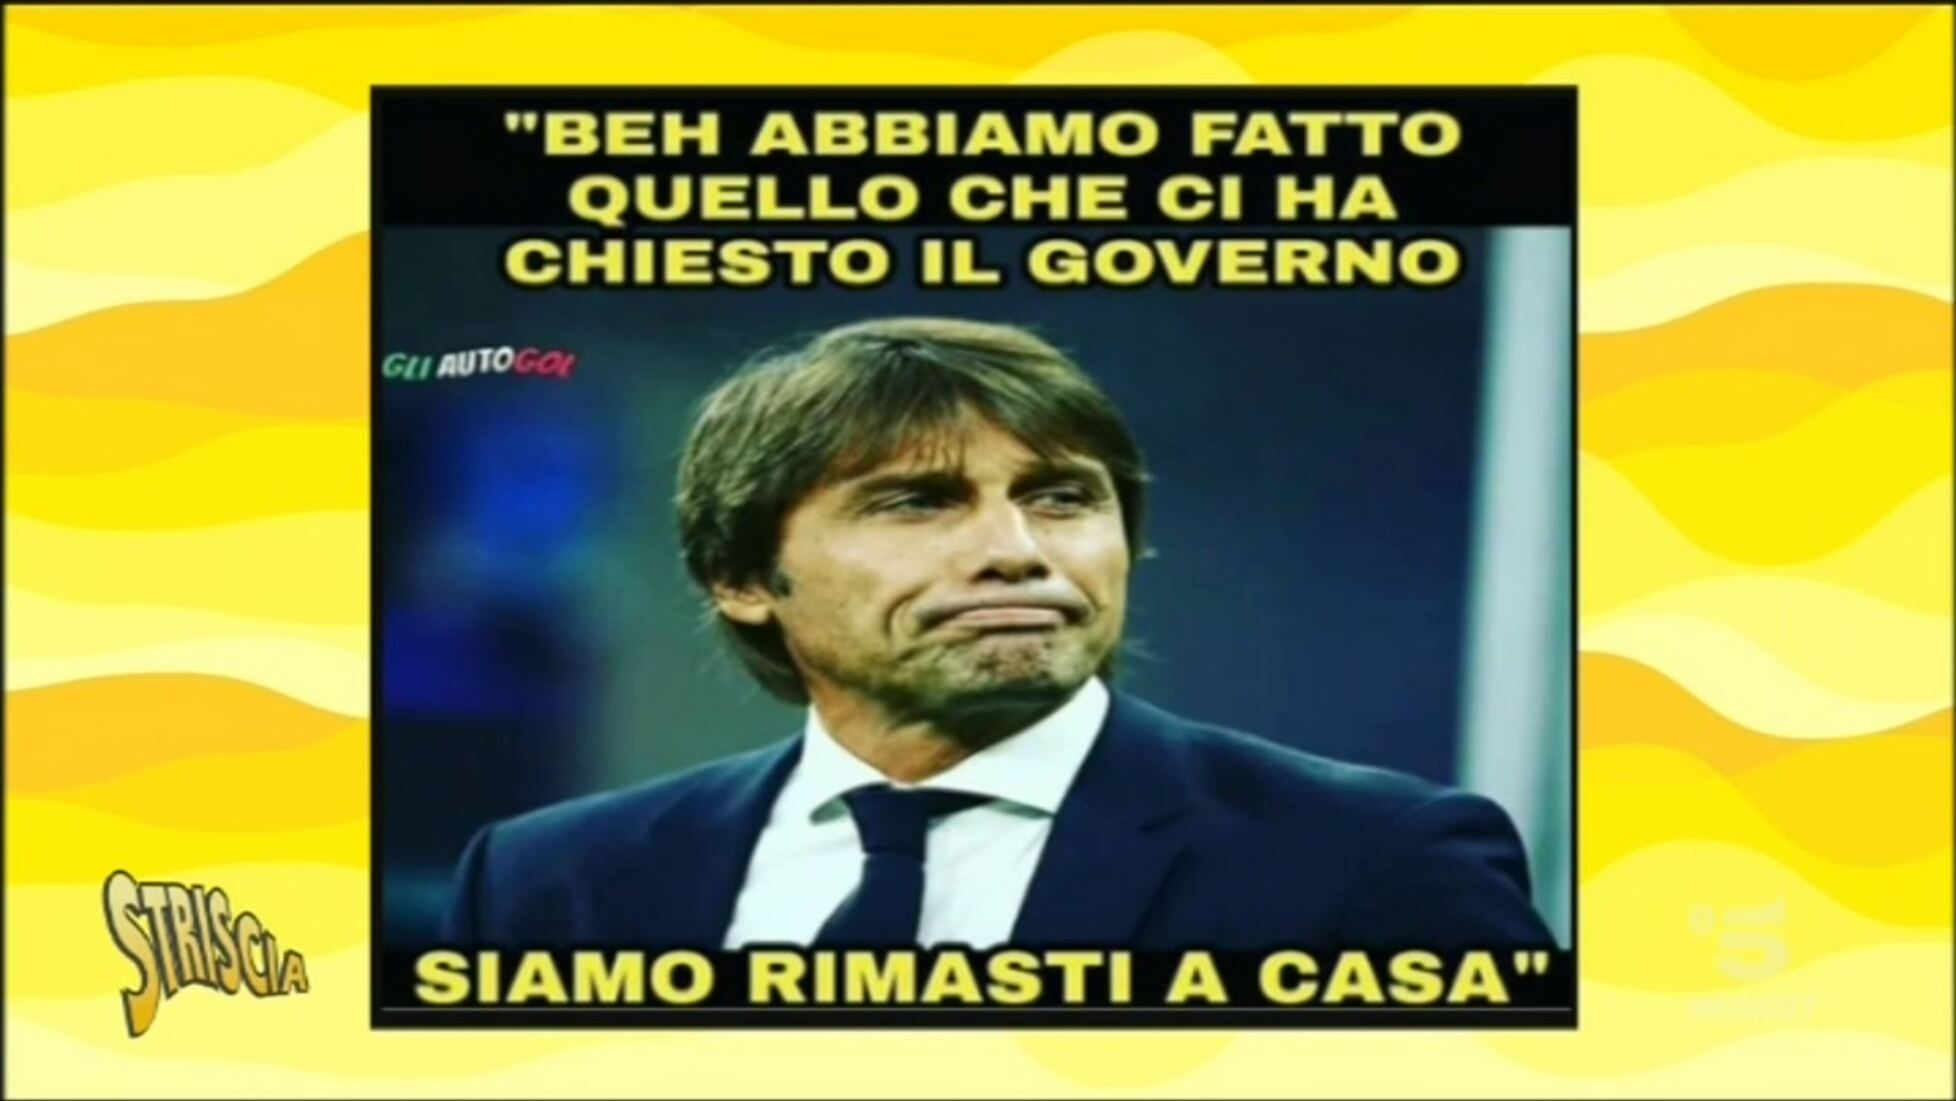 Juve Inter Sui Social I Meme Piu Divertenti Striscia La Notizia Video Mediaset Play